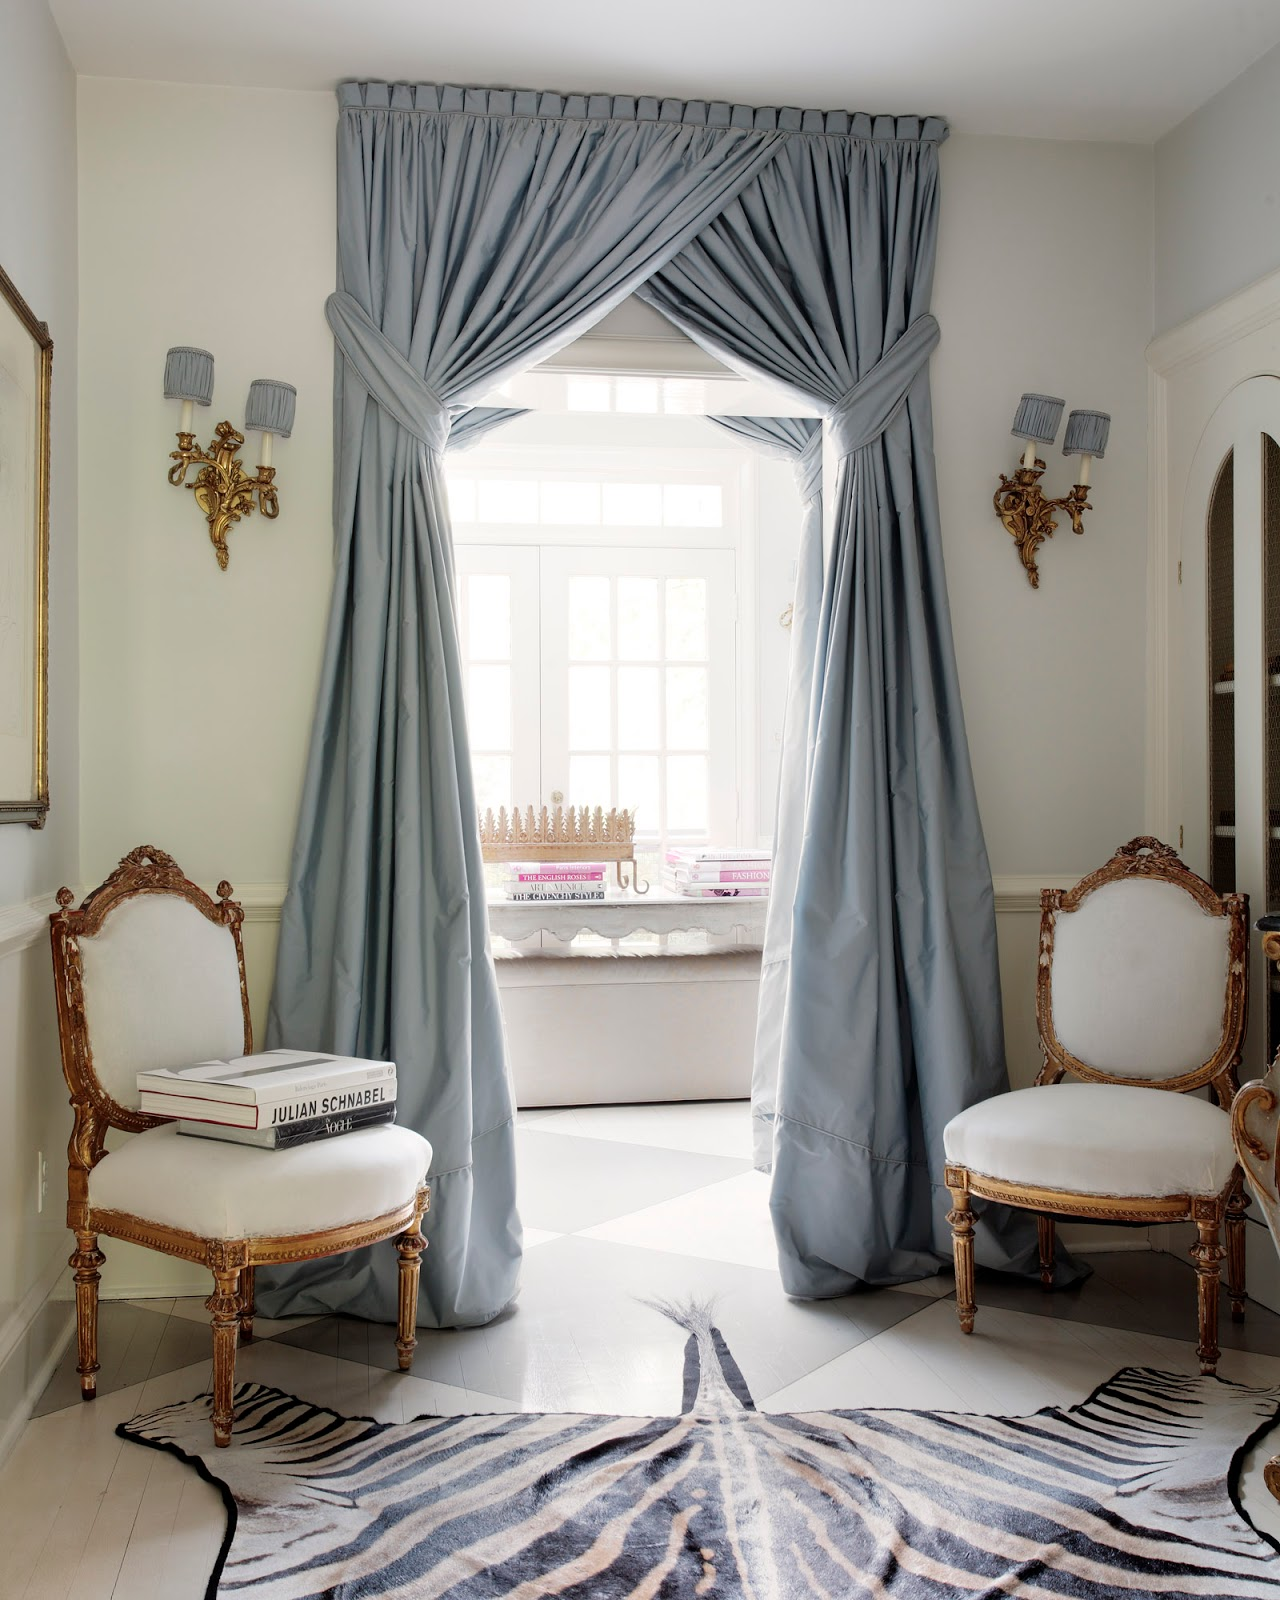 richmond u bedroom master beds with design witt va good of interior designers bunk ryland finest